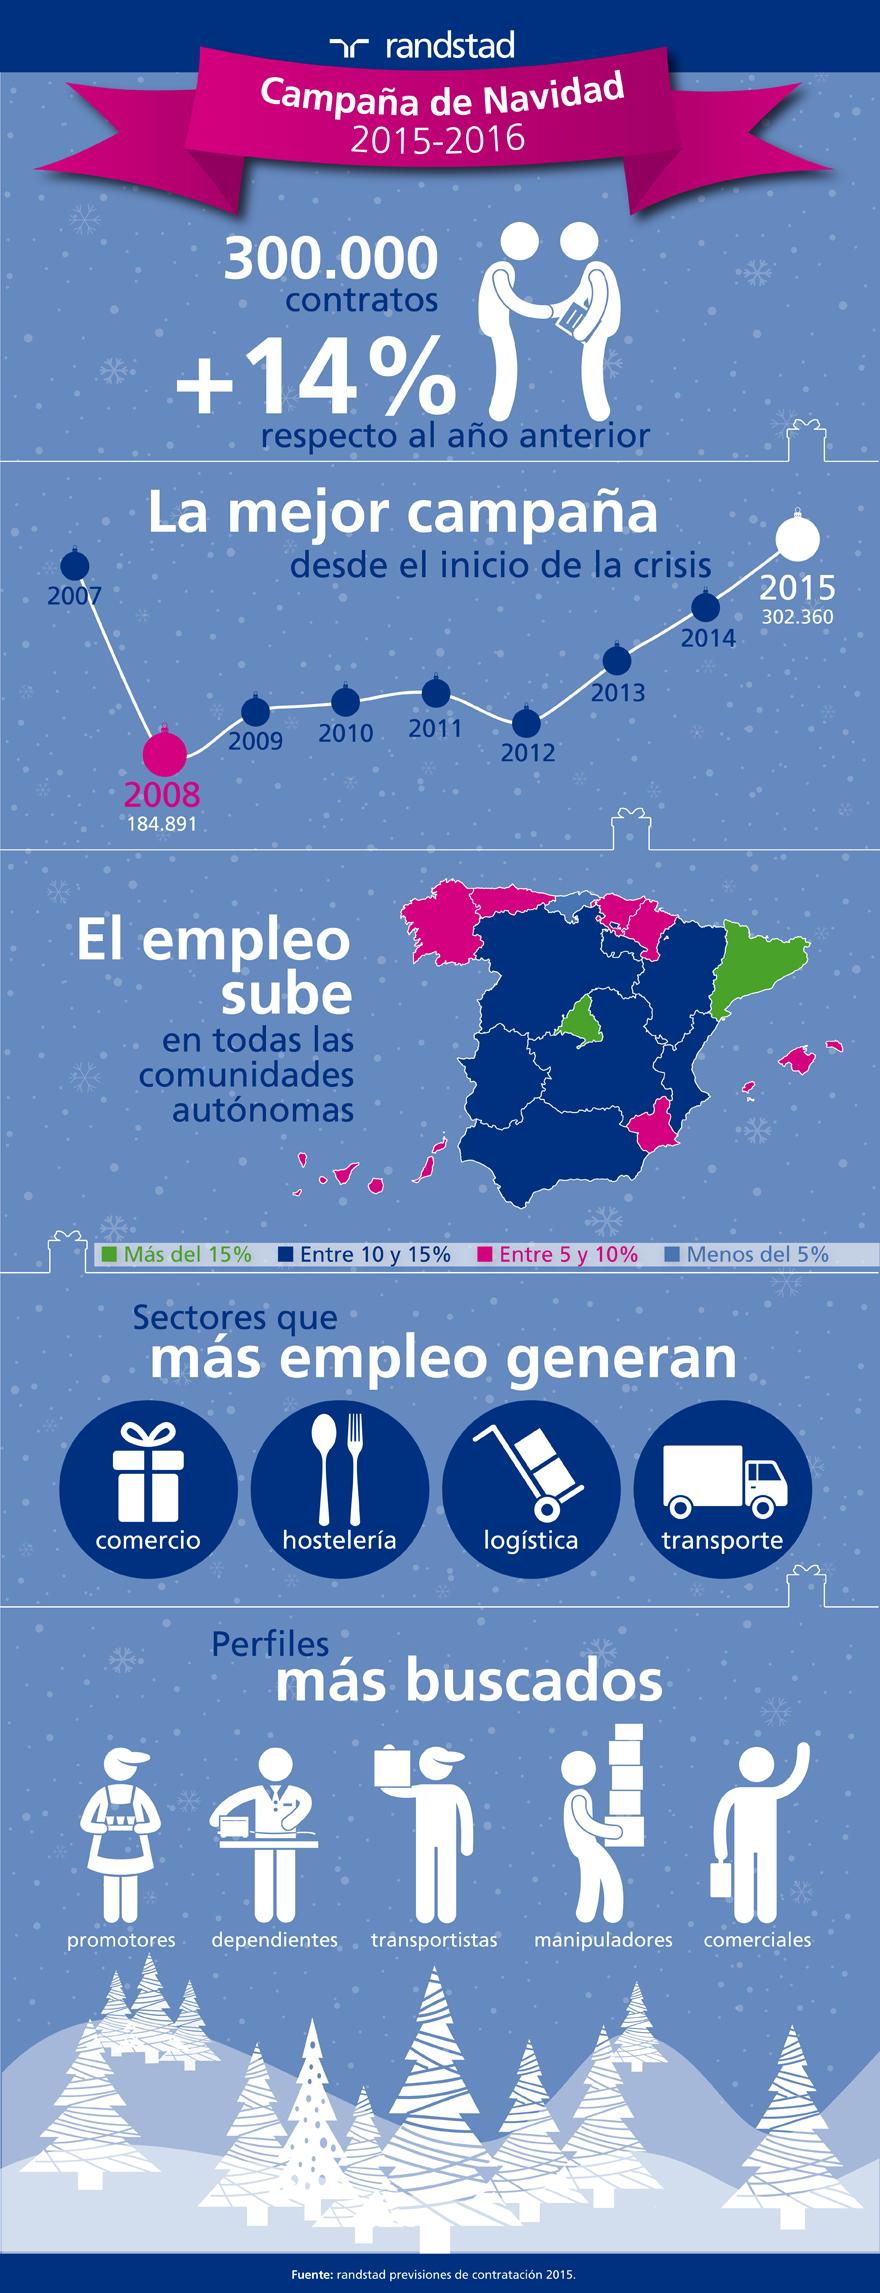 infografia-prevision-contratacion-navidad-2015.jpg